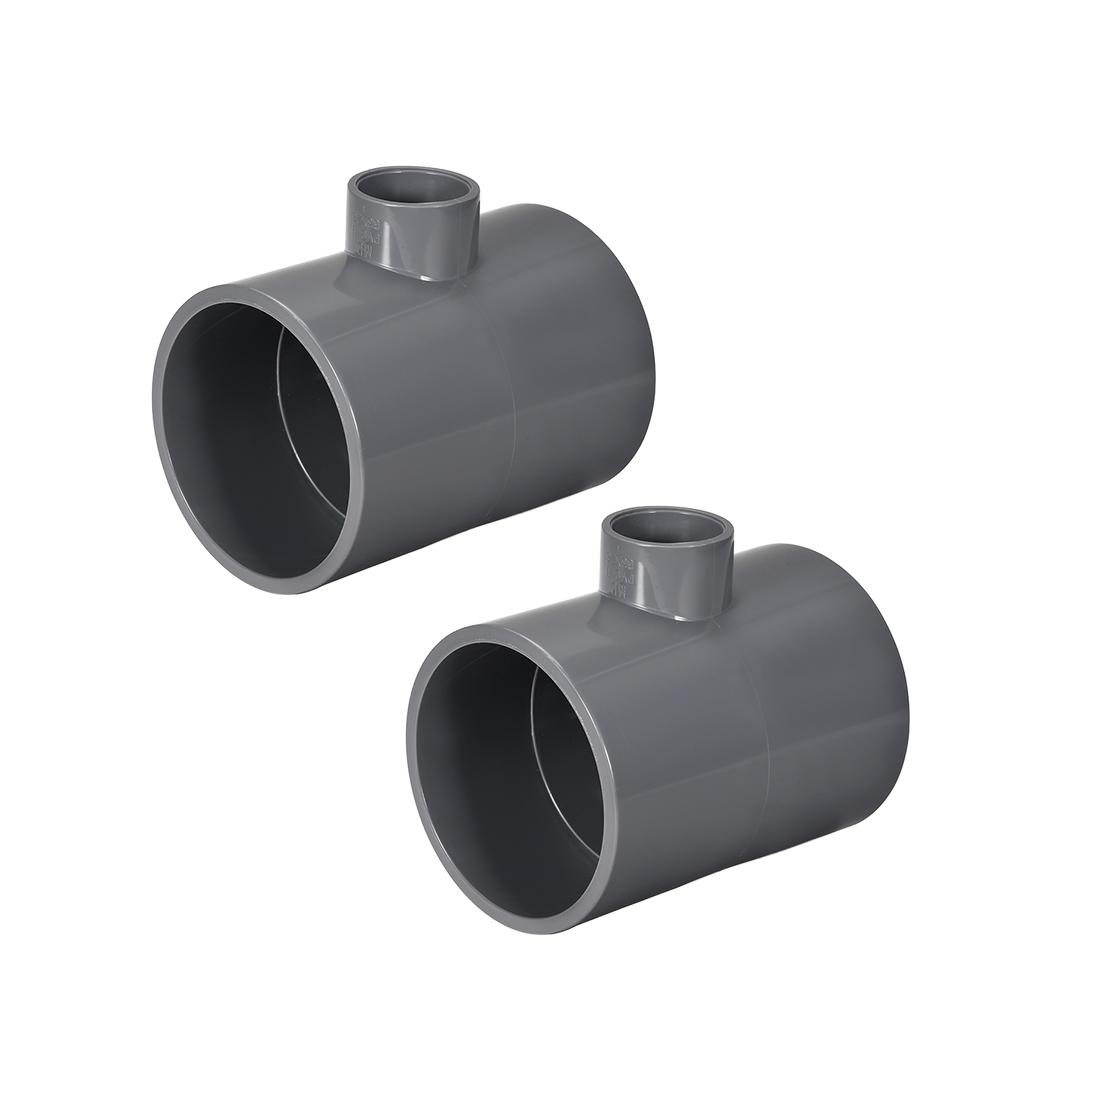 PVC Pipe Fitting Tee 401-Series Gray 1-inch x 2-1/2inch Socket 2pcs